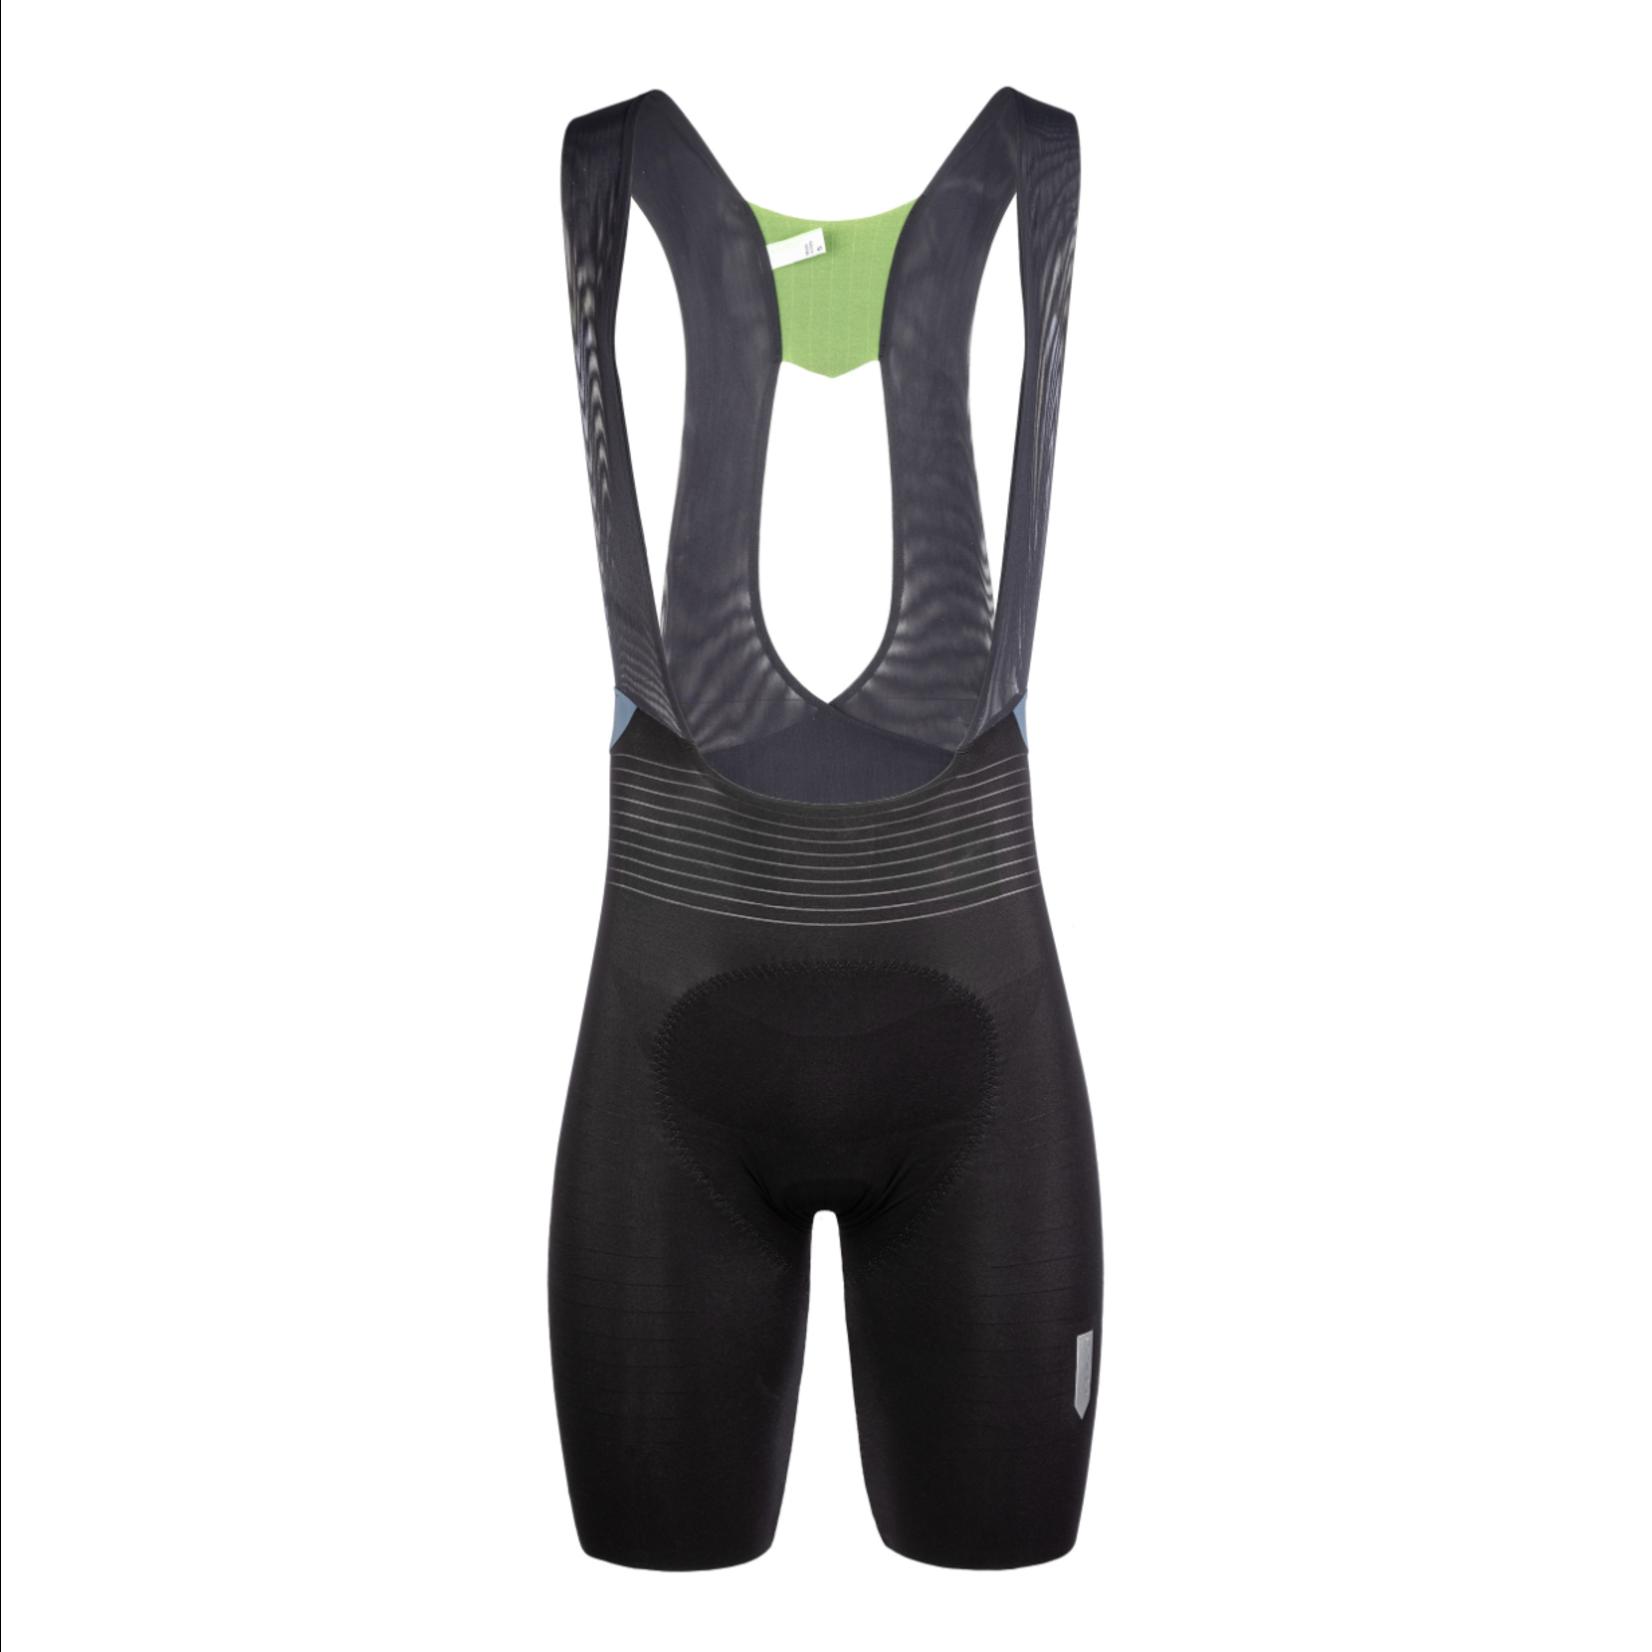 Q36.5 Q36.5 Unique Bib Shorts - Black